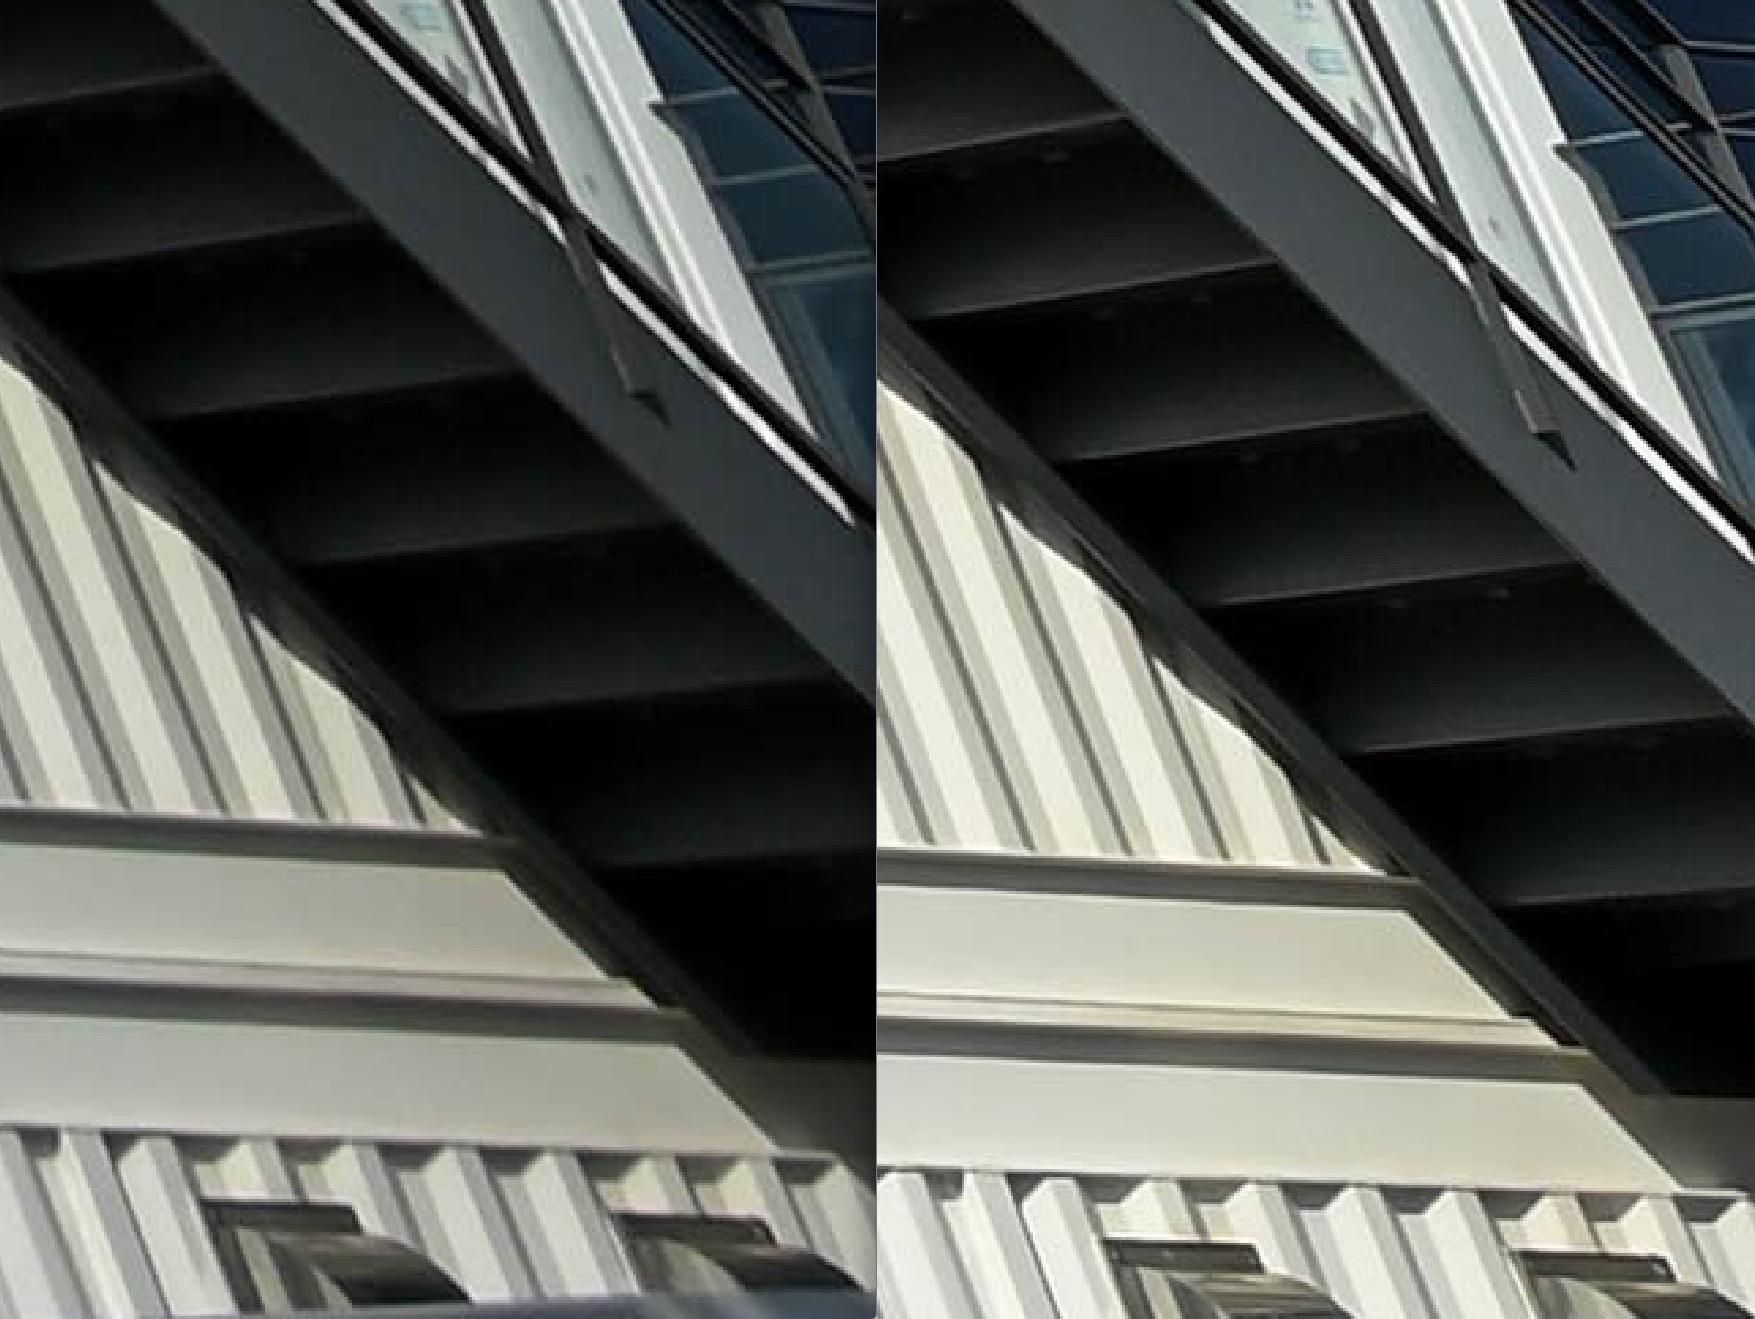 nikon z14-24mm f2.8s 作例 比較